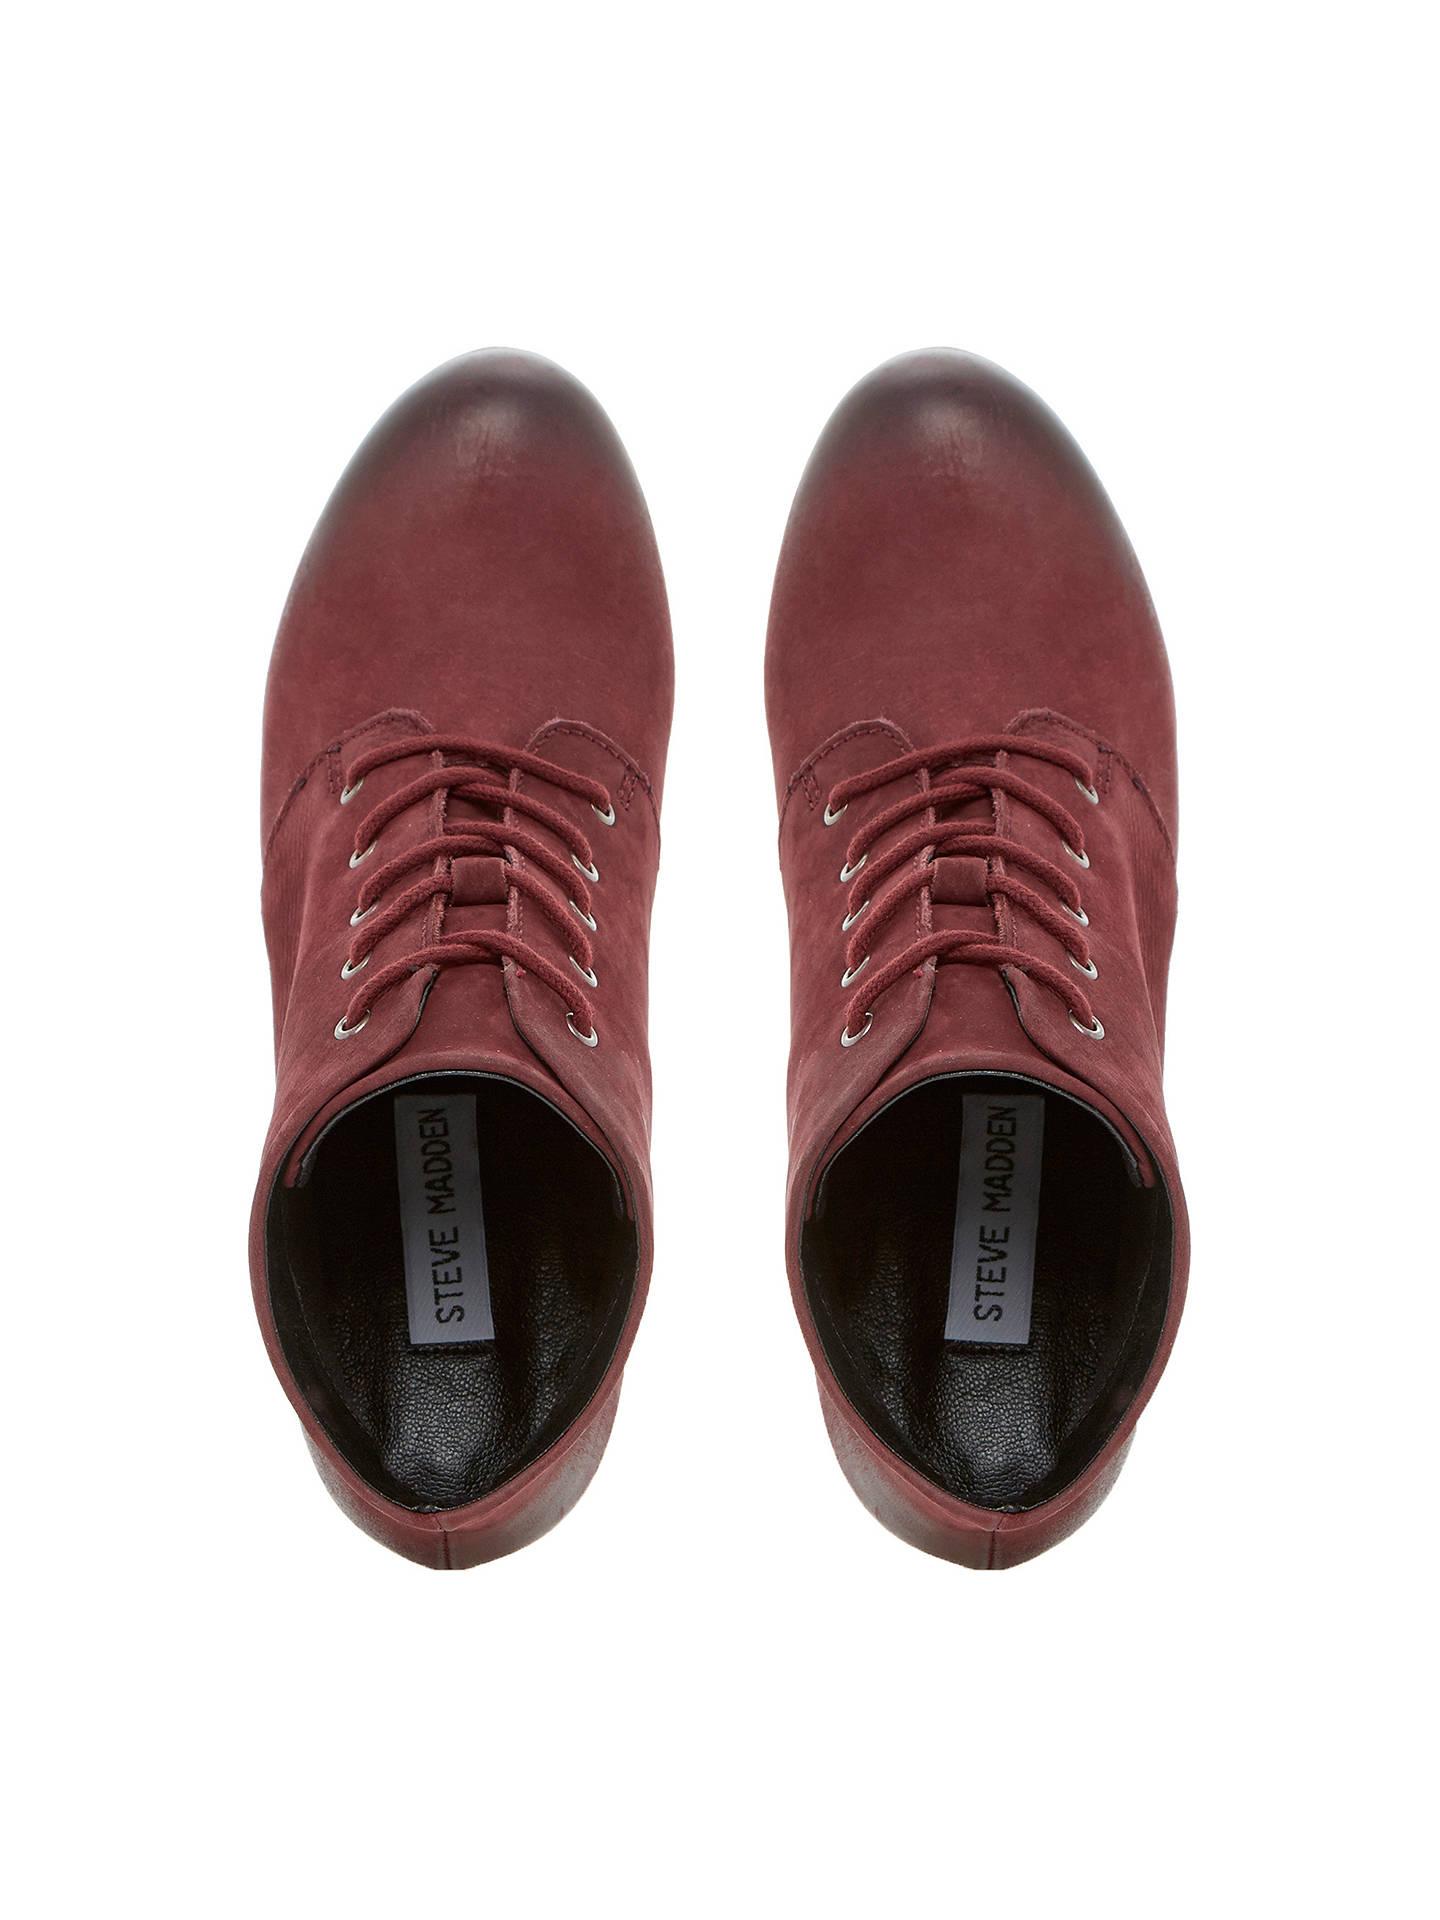 9e43debbcb1 Steve Madden Raspy Platform Leather Ankle Boots at John Lewis   Partners